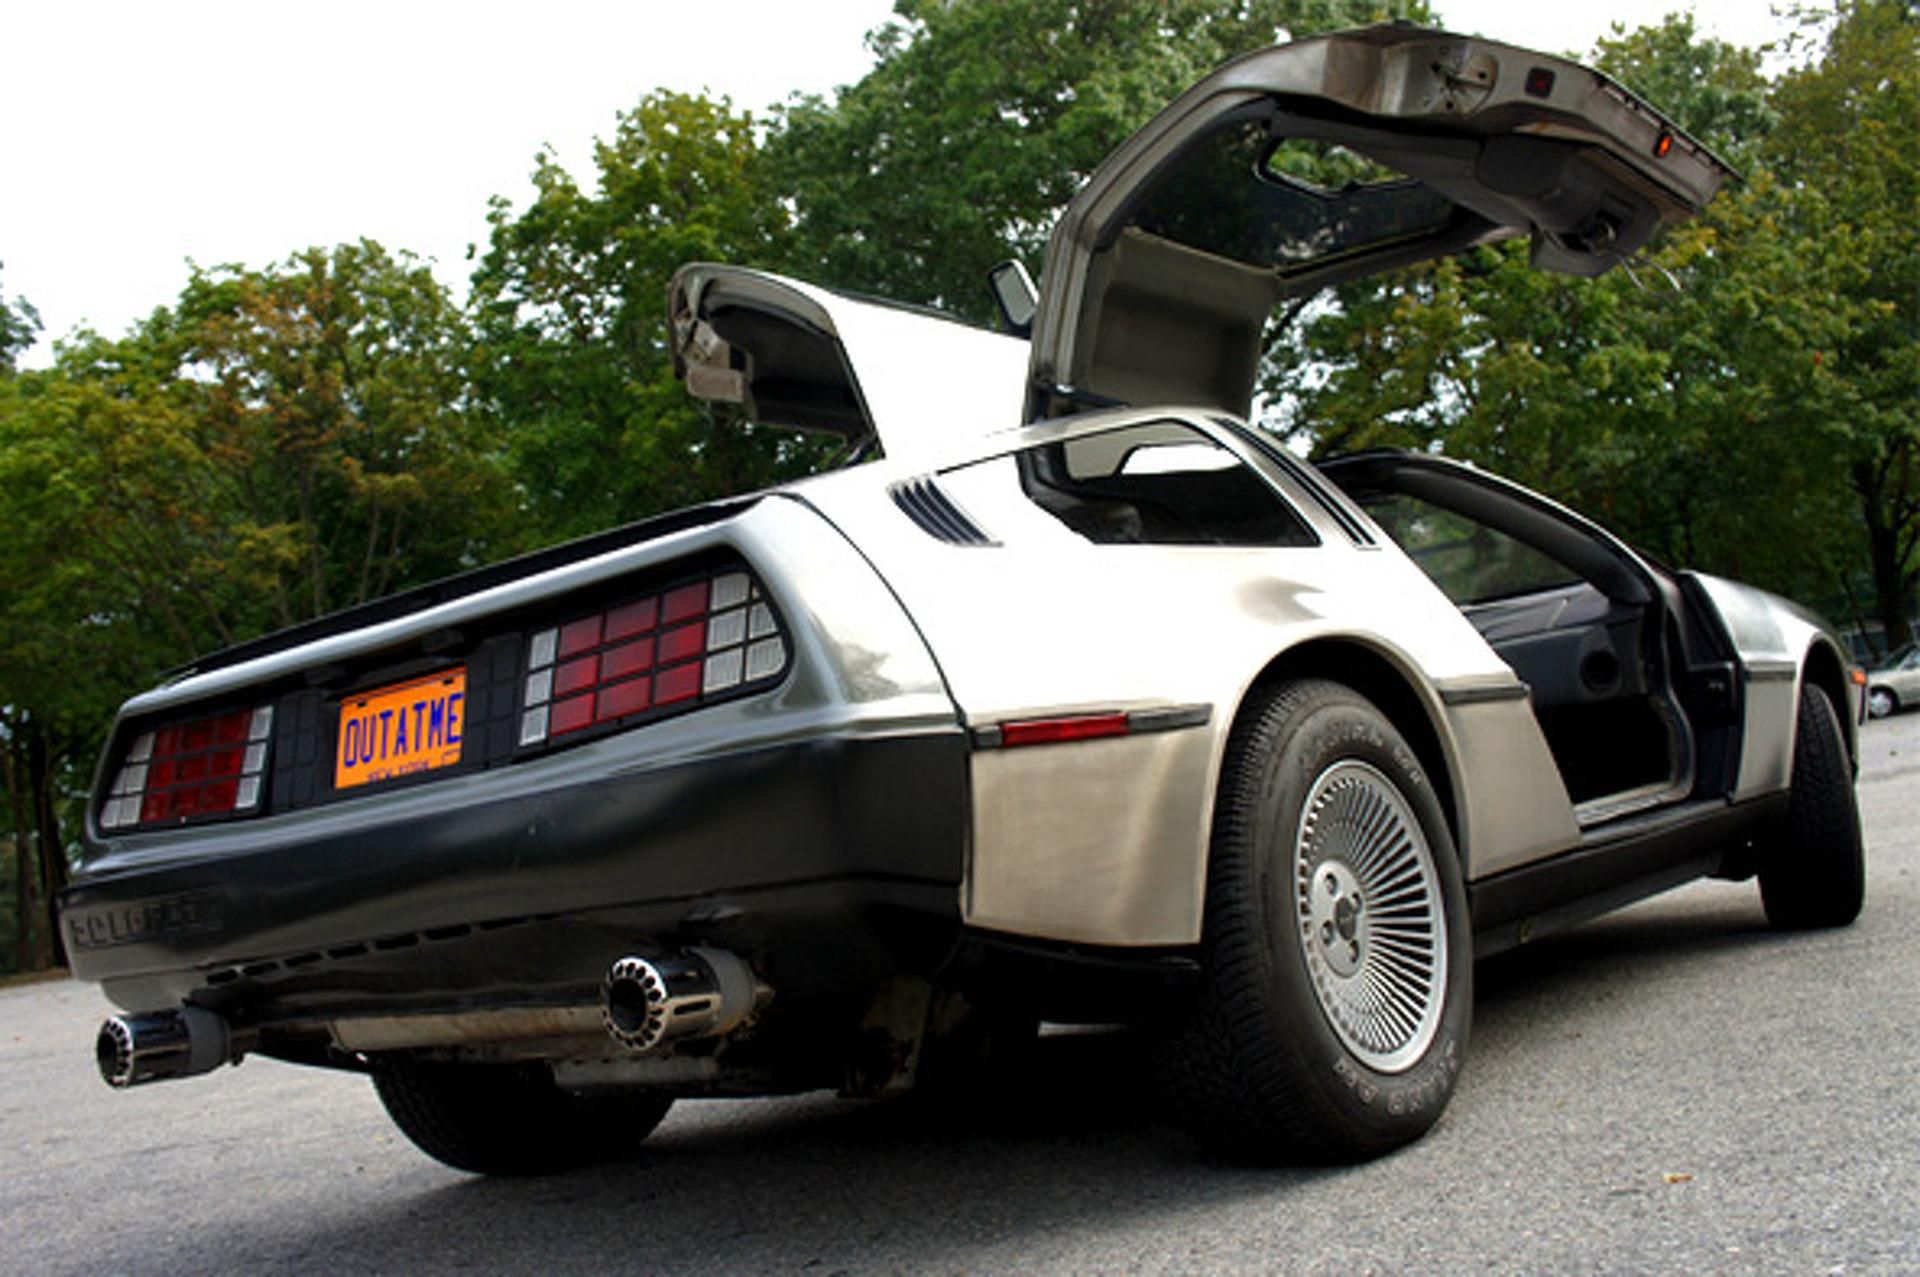 eBay Car of the Week: 1981 DeLorean DMC-12